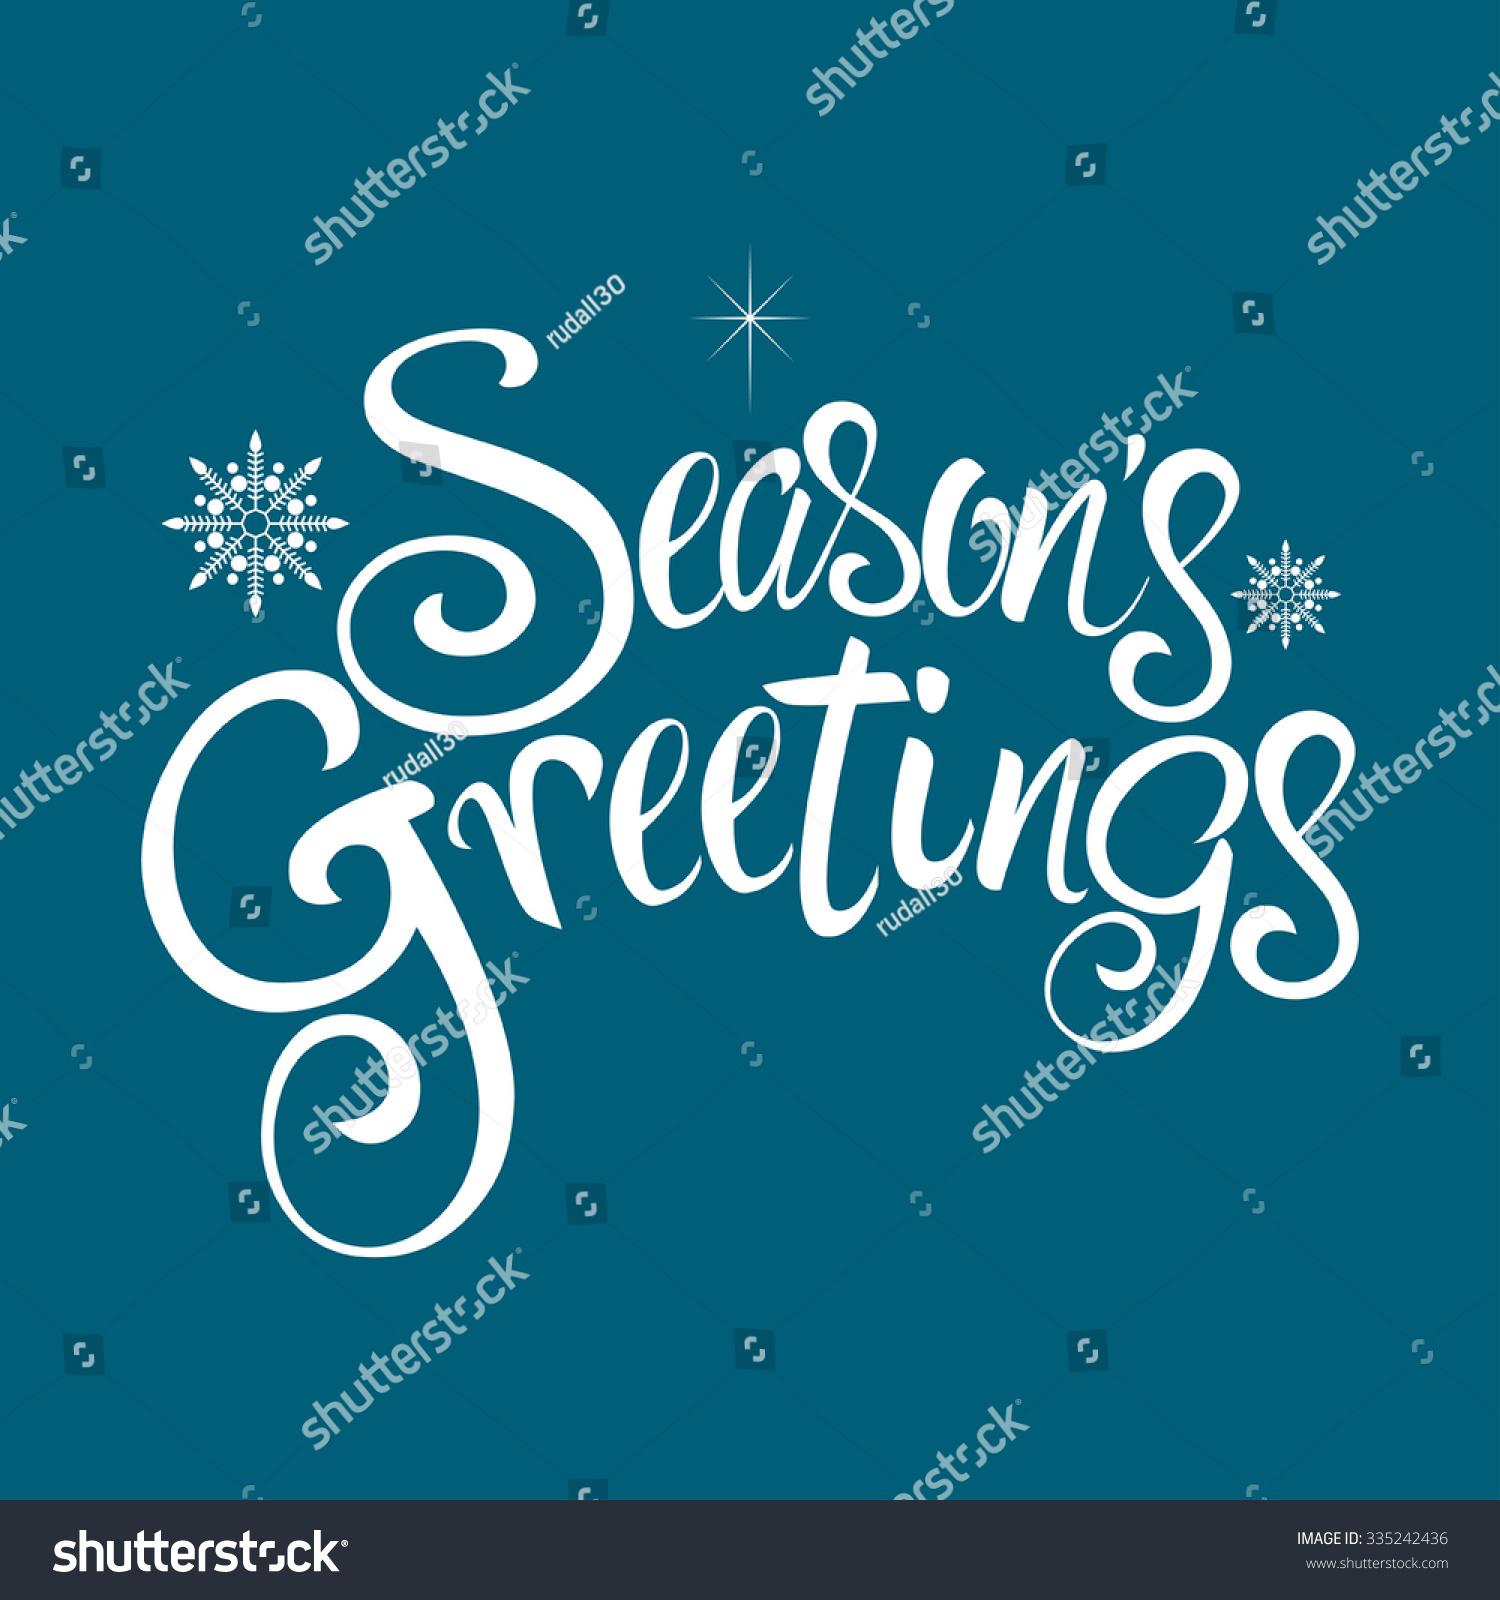 text seasons greetings decorative snowflakes christmas stock